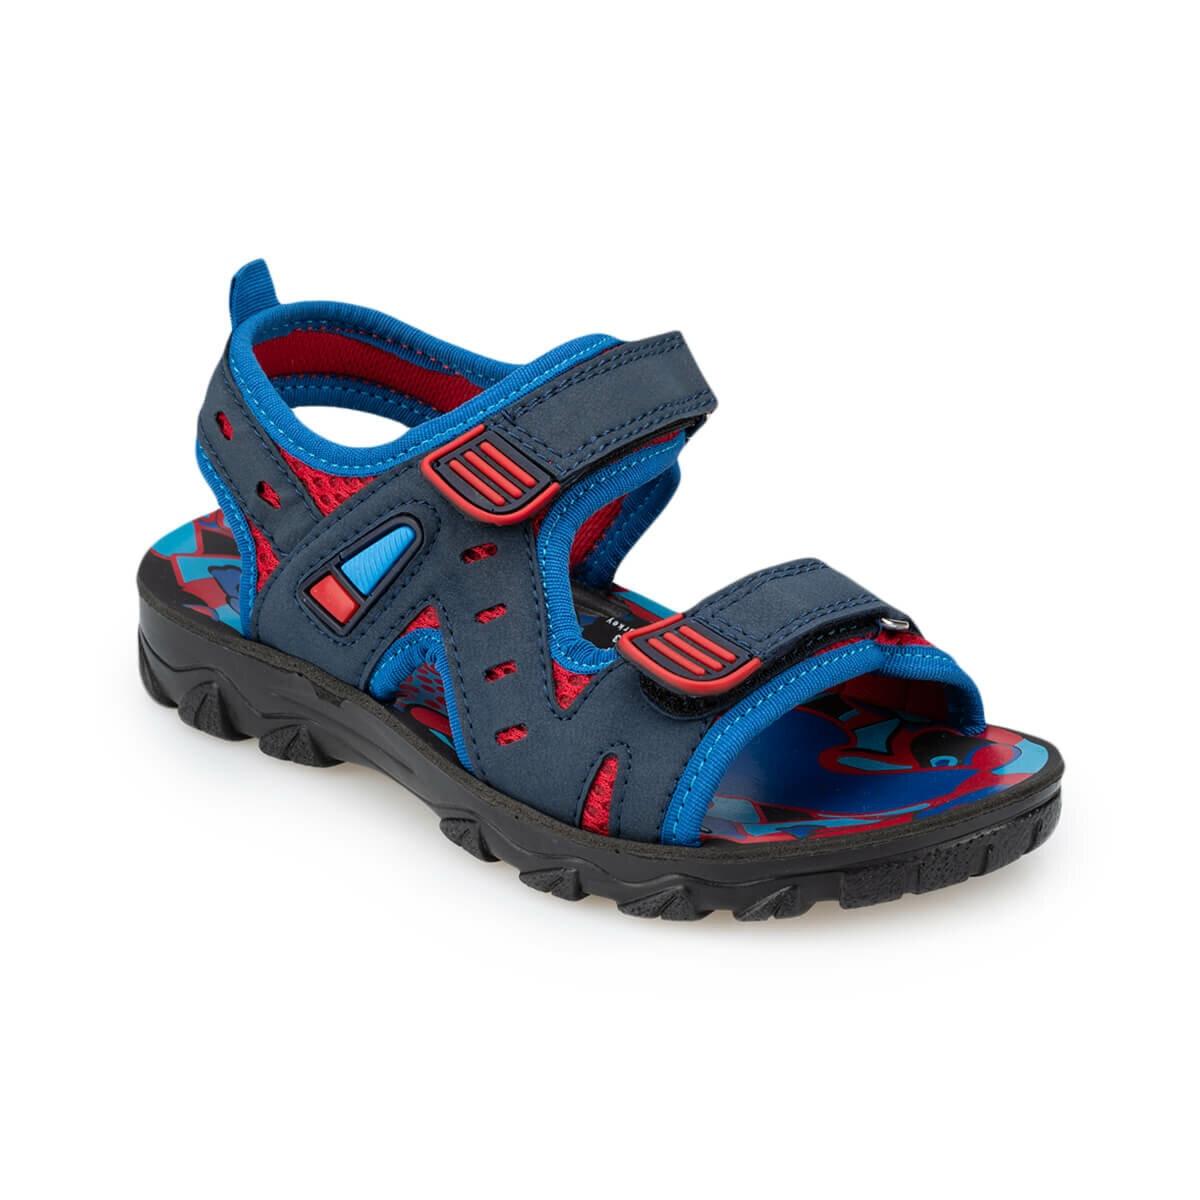 FLO 91. 510241.F Navy Blue Male Child Sandals Polaris